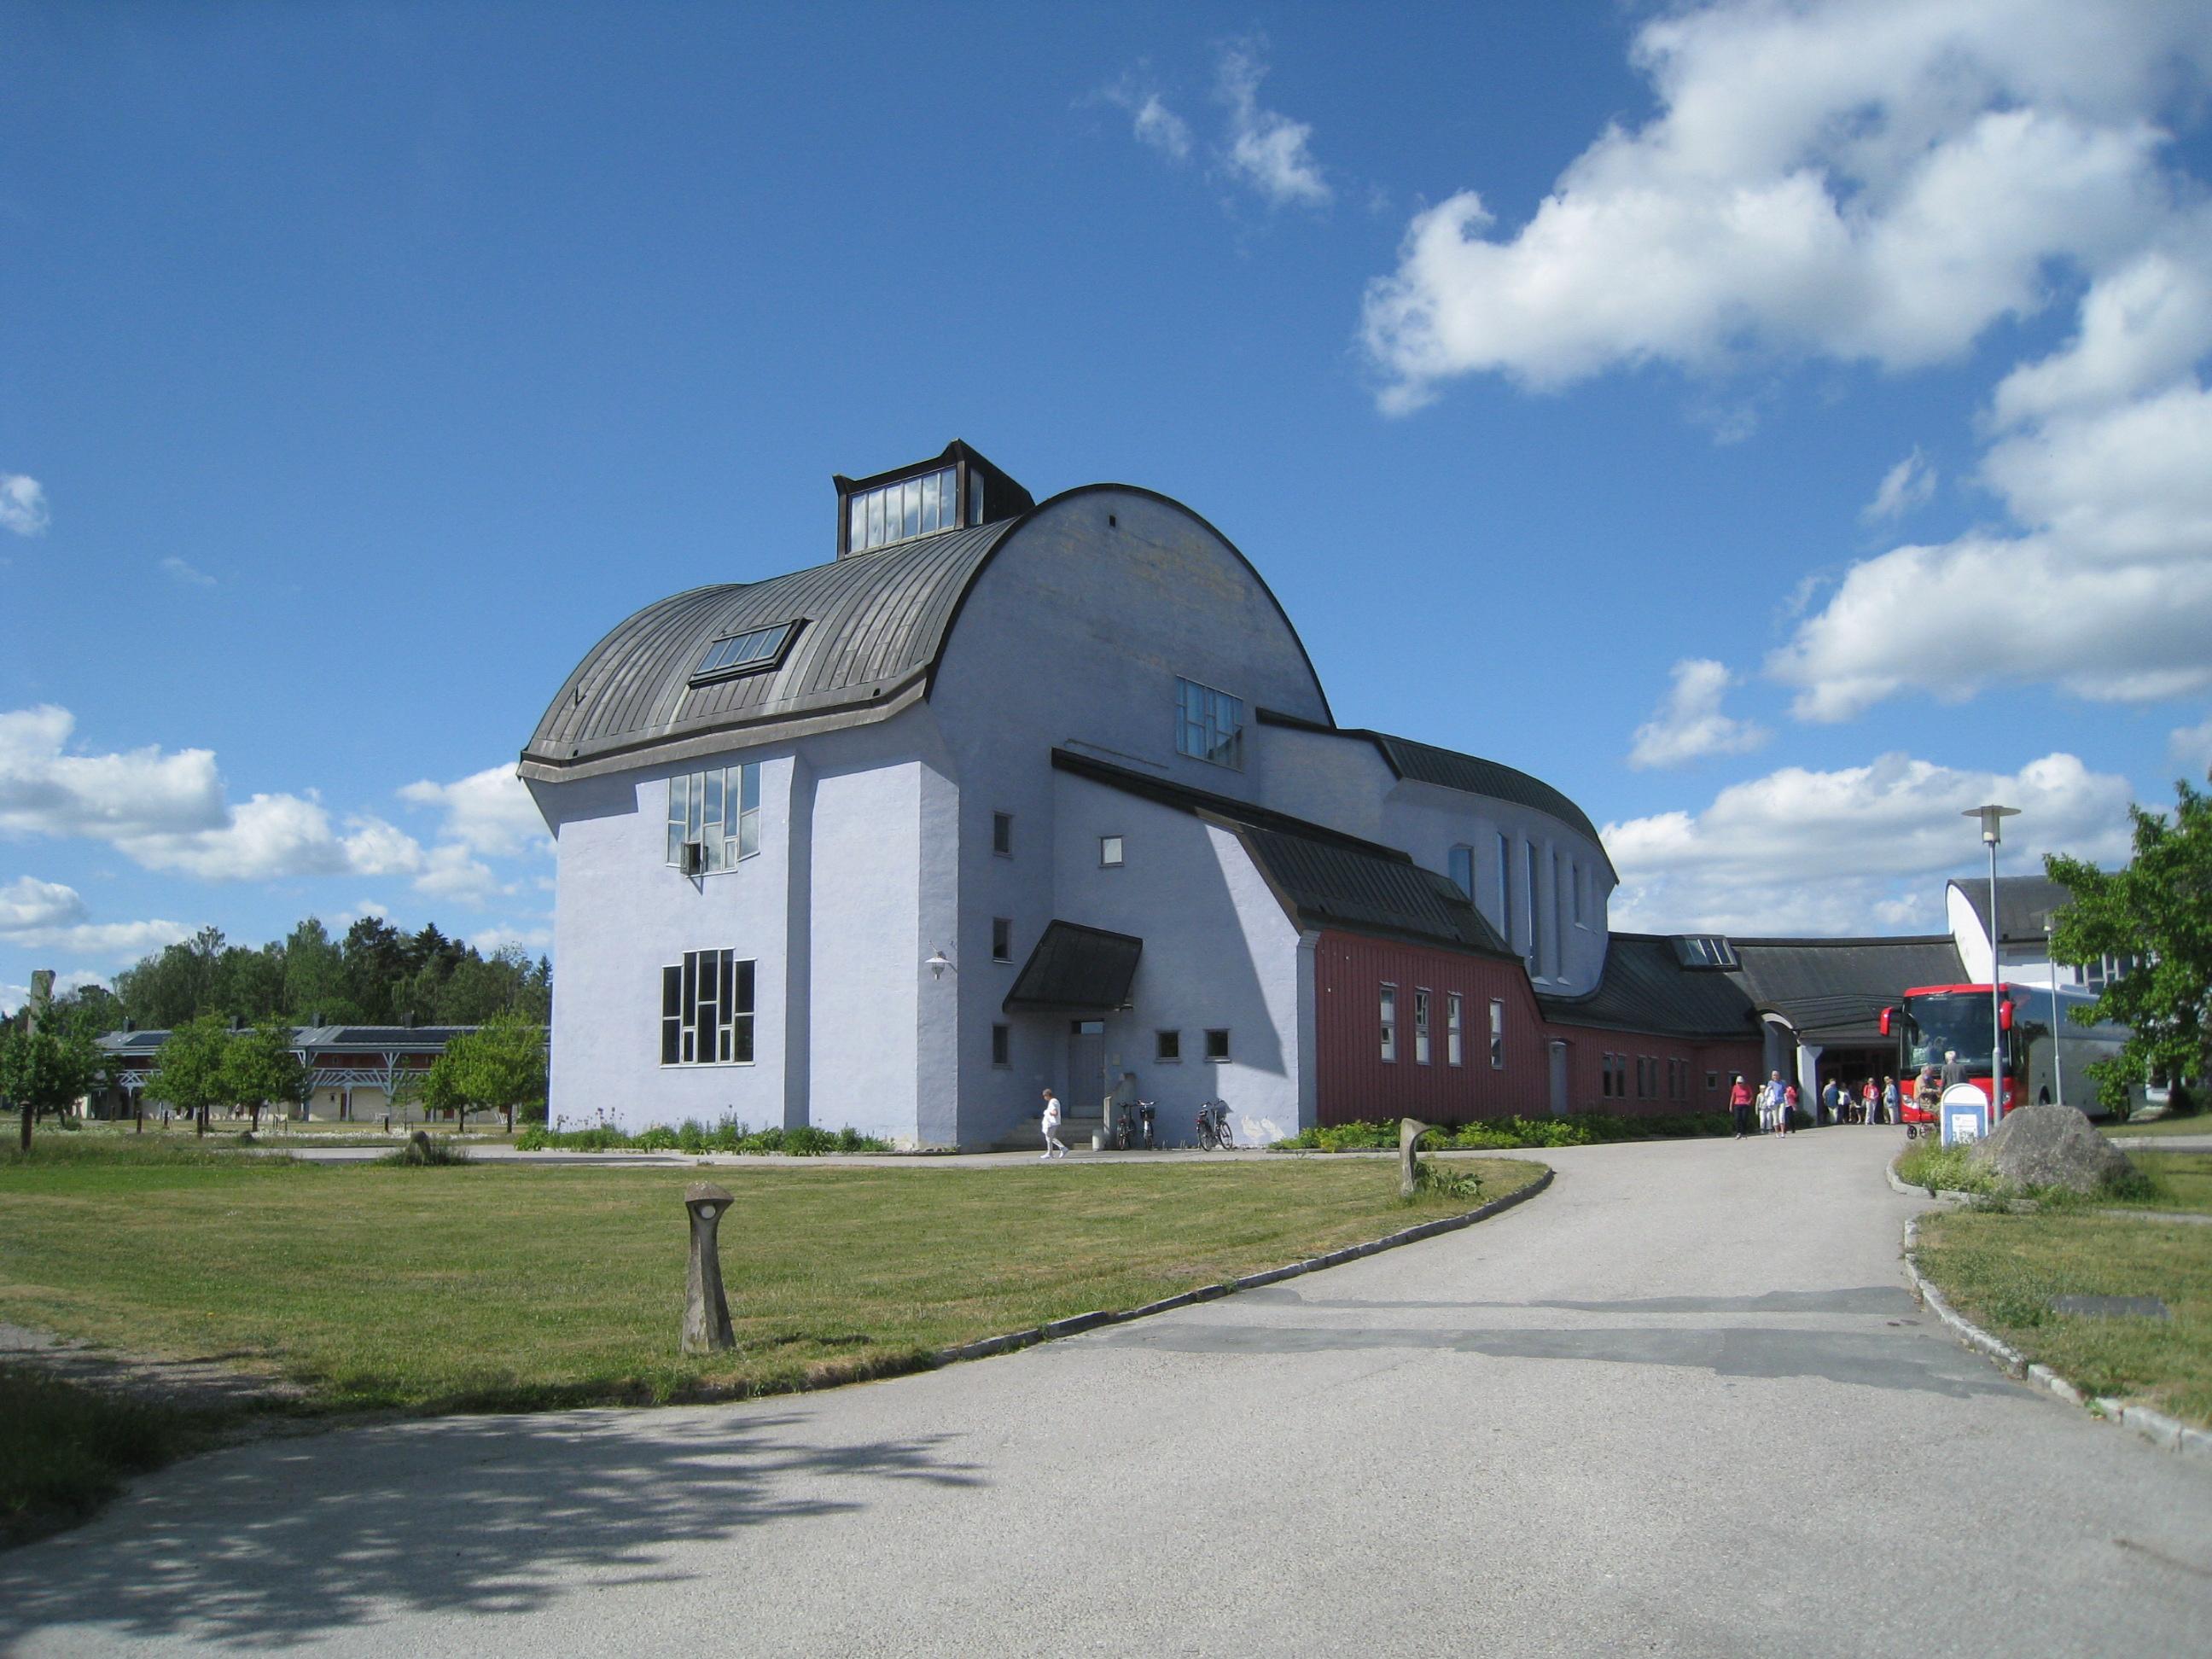 Jrna, Sweden Events Next Week | Eventbrite